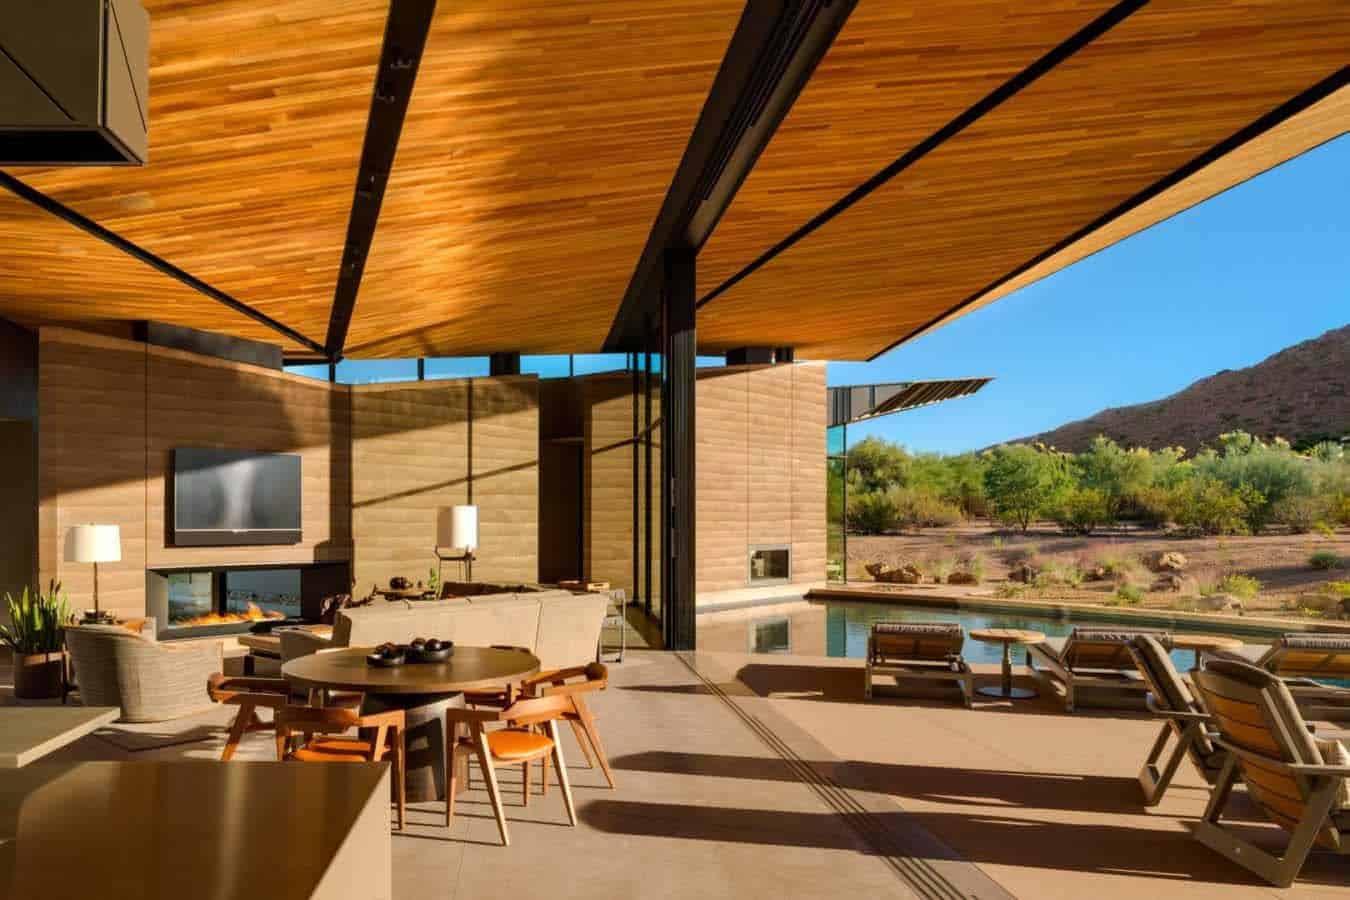 desert-modern-patio